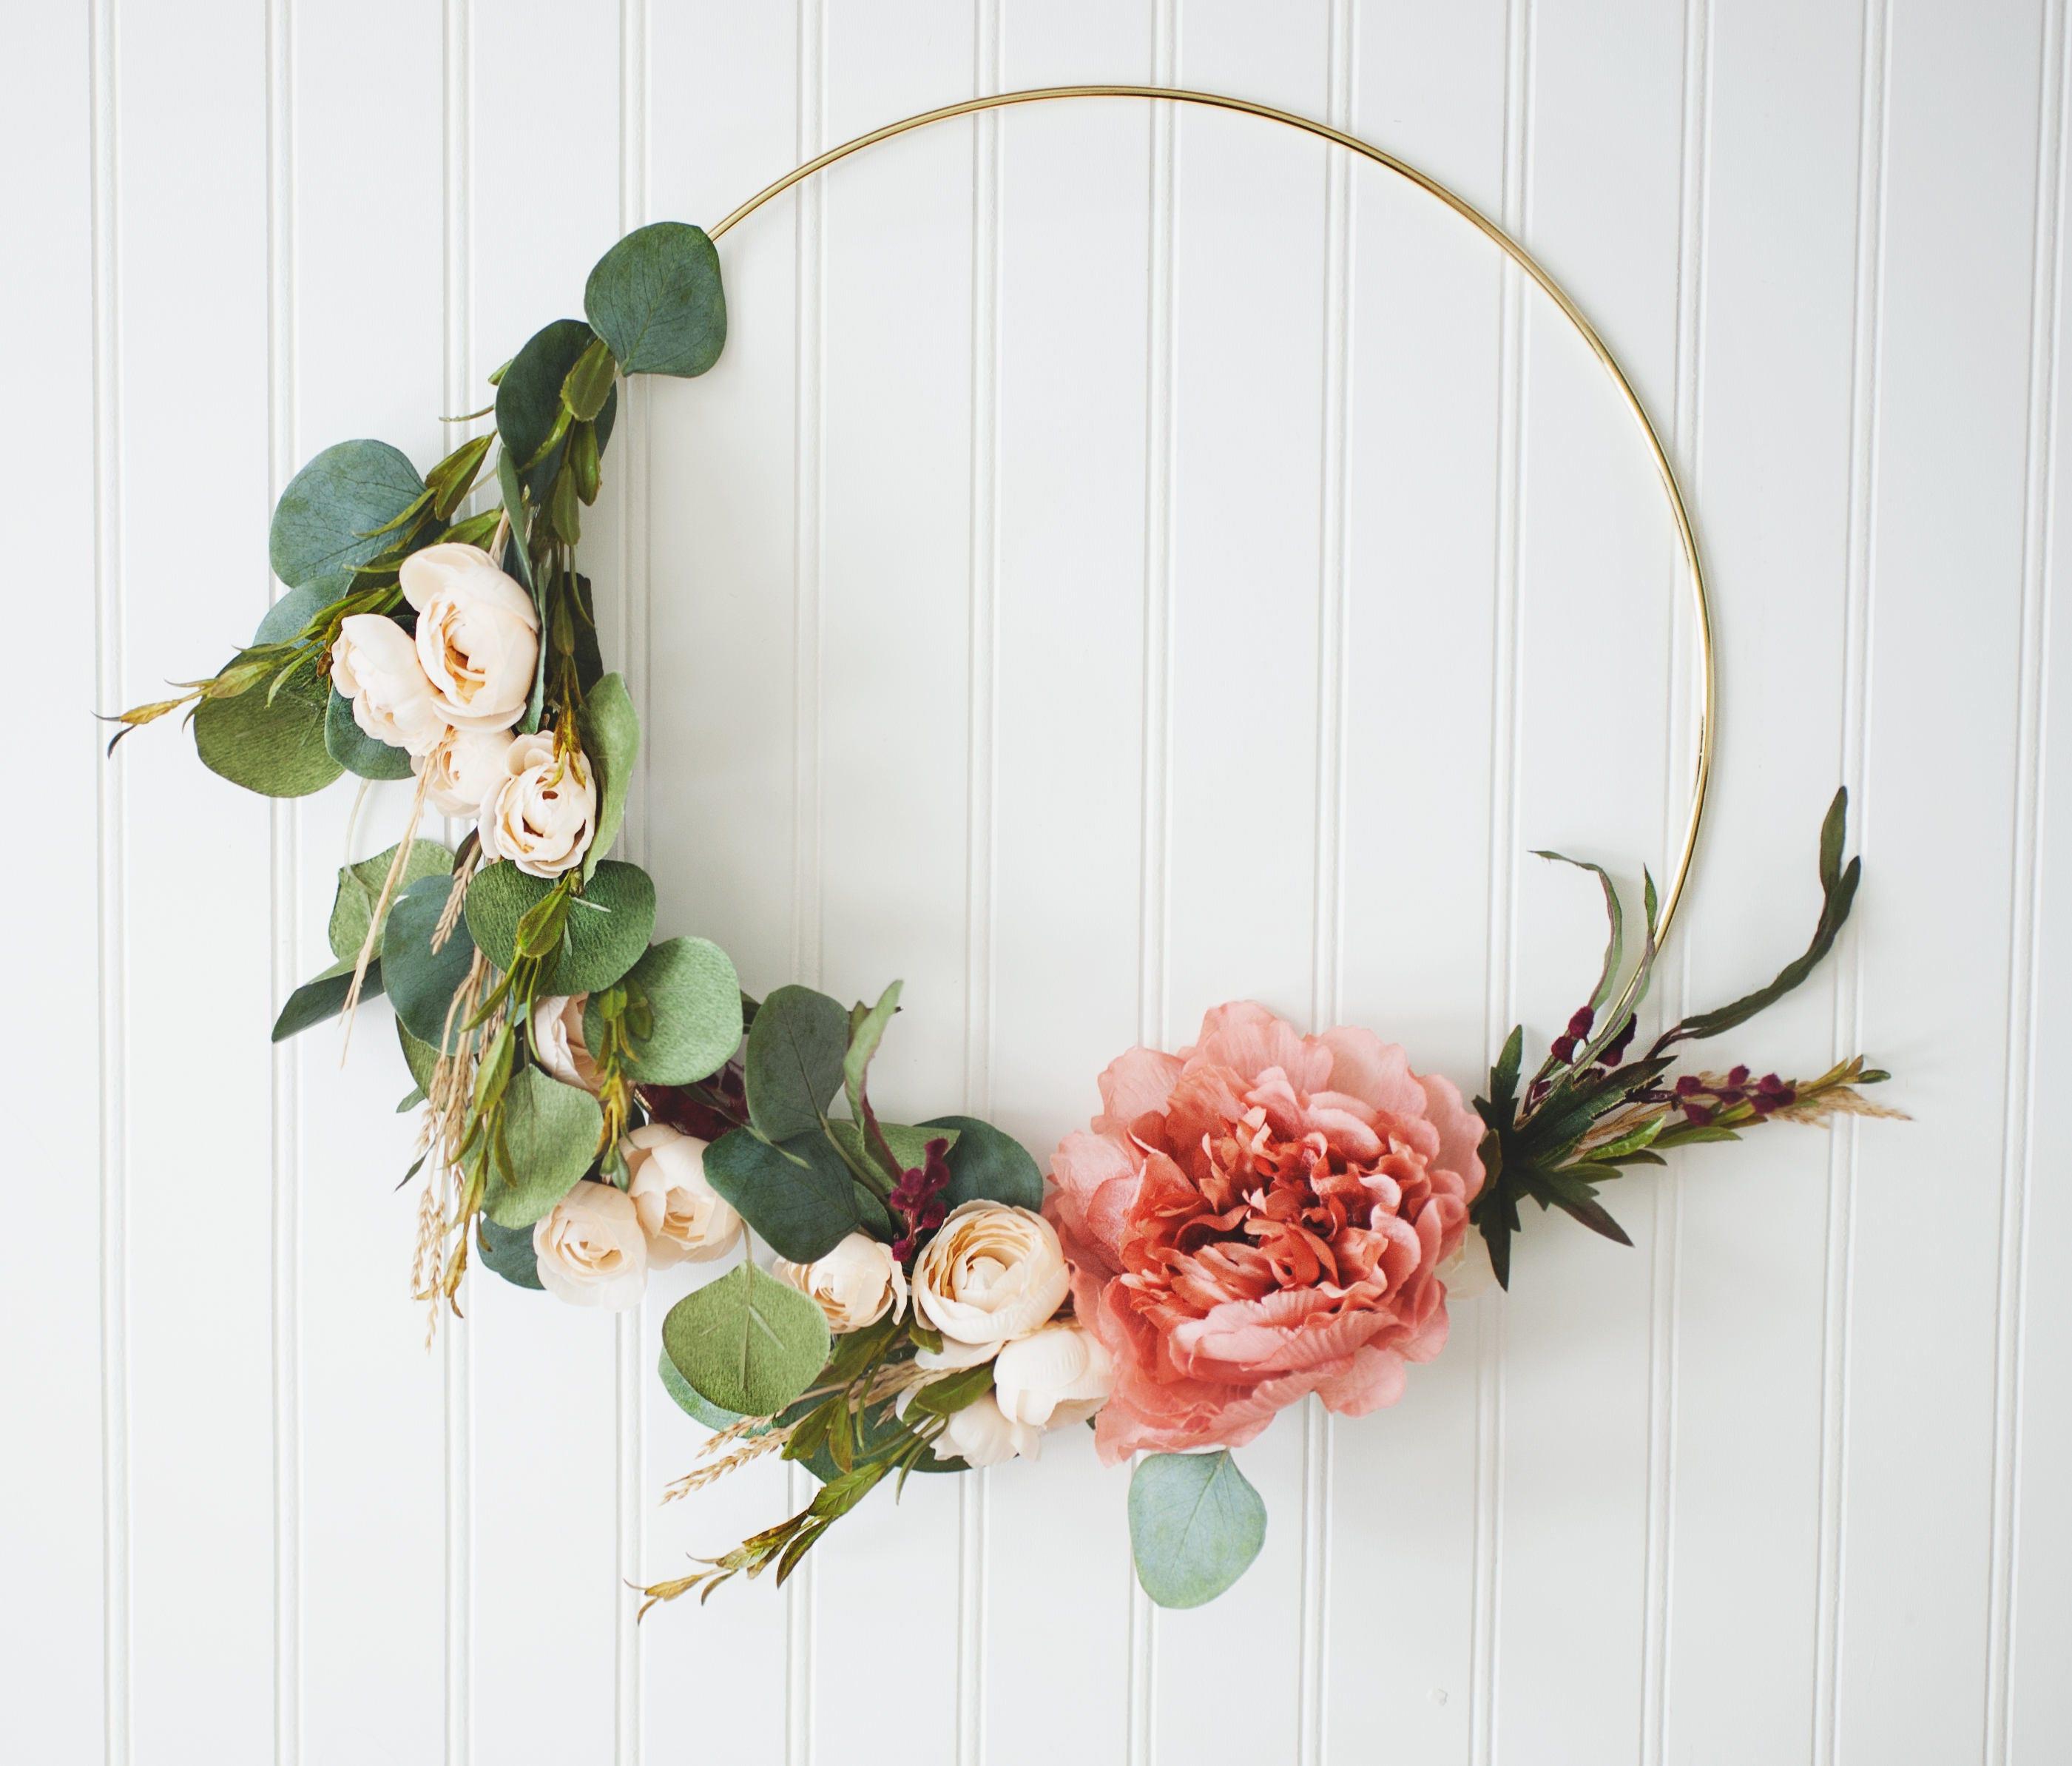 Gold Hoop Wreath, Floral Chic, Boho Nursery Wreath, Newborn Photo ...